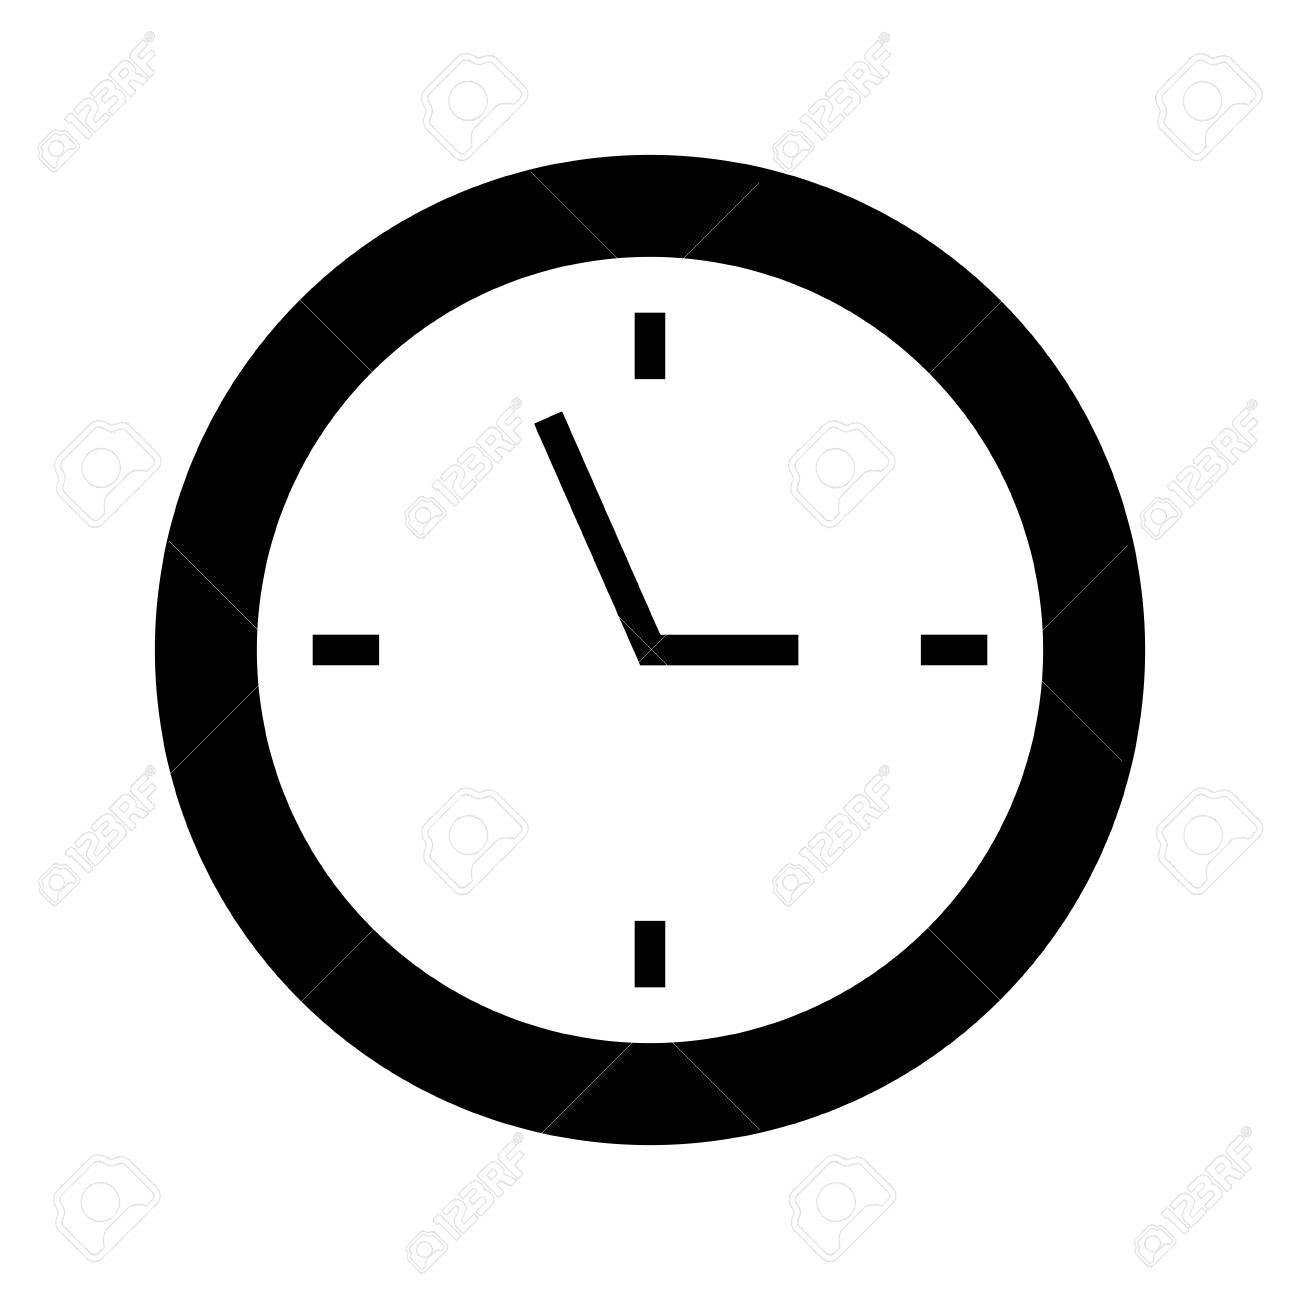 Reloj Gráfico Dibujos Diseño Negro Icono Vector Animados KJ13TlFc